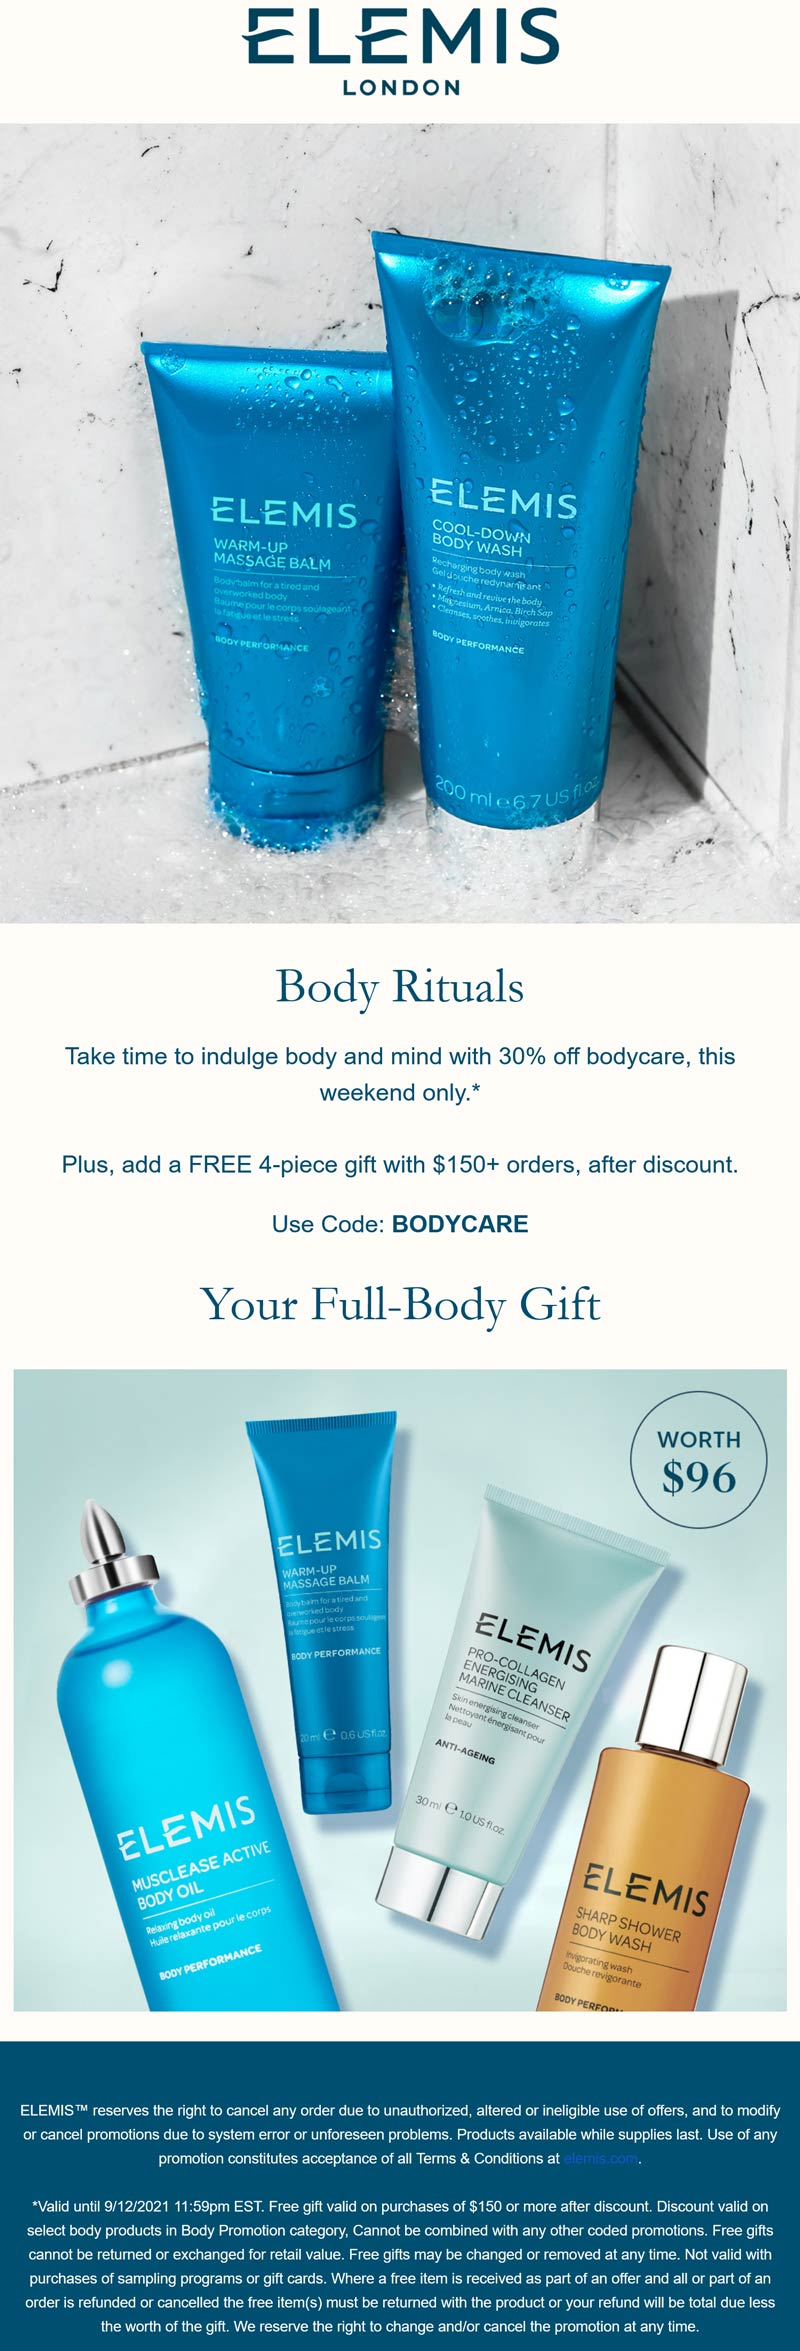 Elemis stores Coupon  30% off body care & free 4pc with $150 spent at Elemis via promo code BODYCARE #elemis